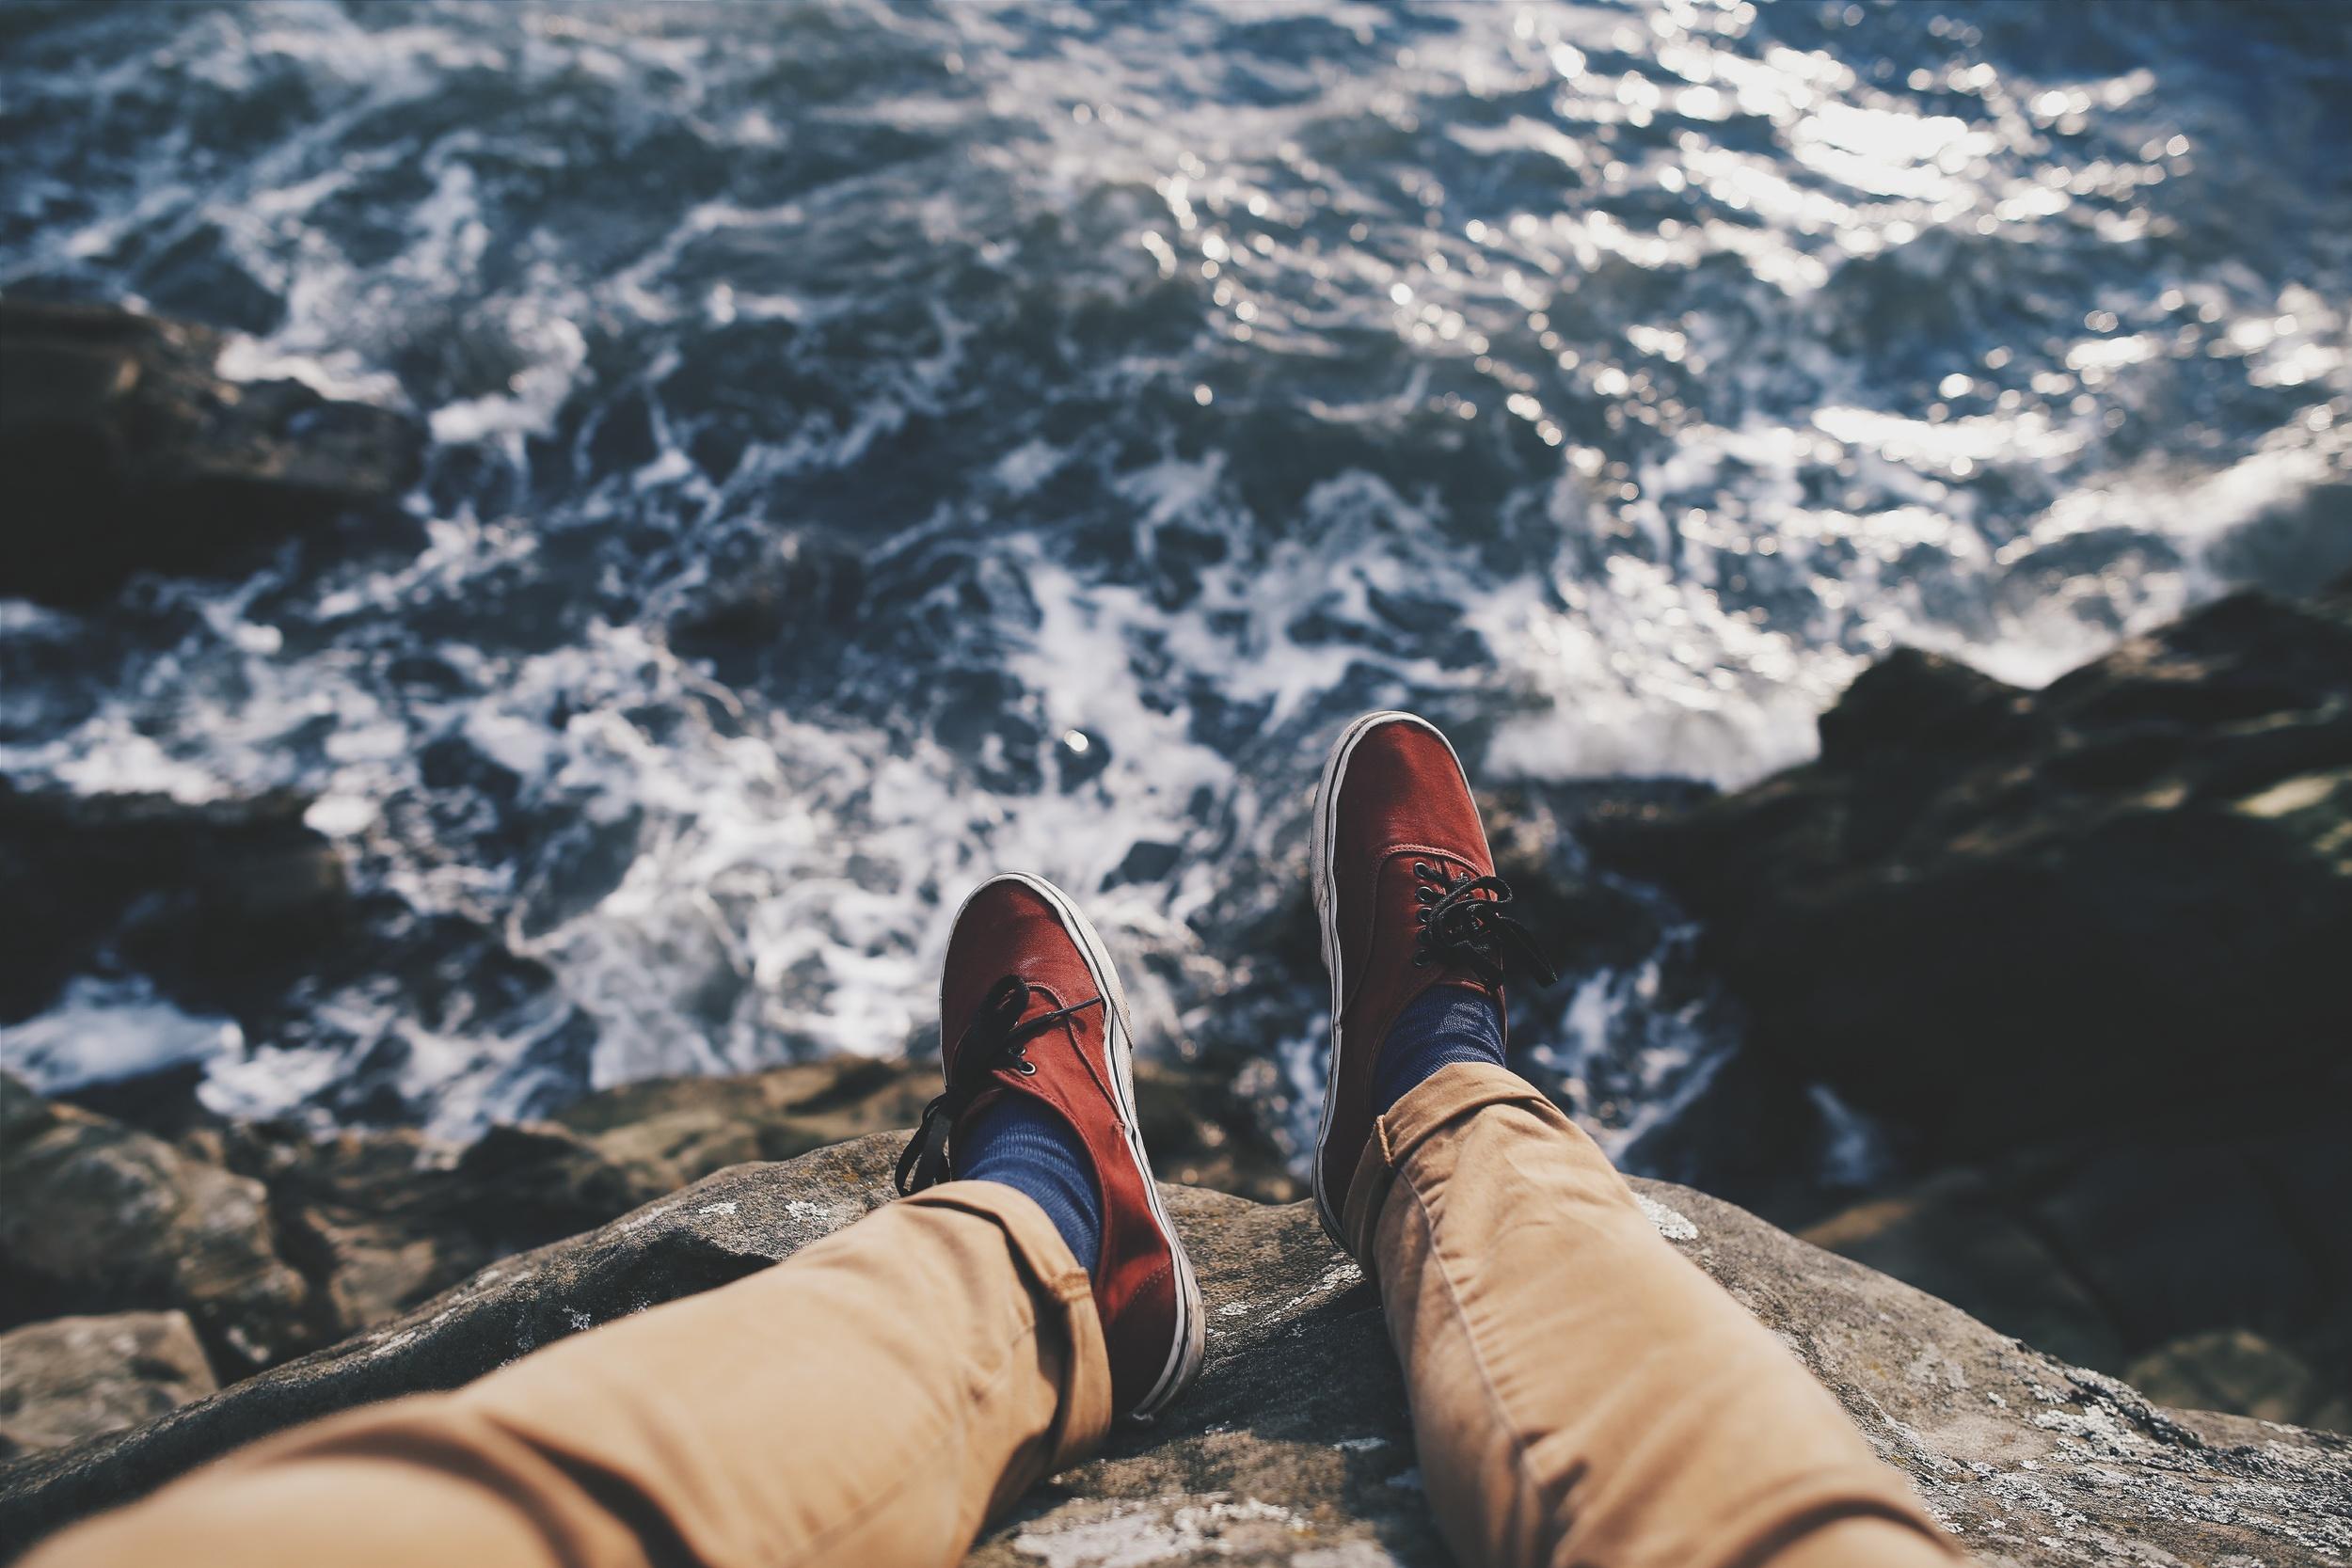 Awareness of Self-Defeating Behaviors